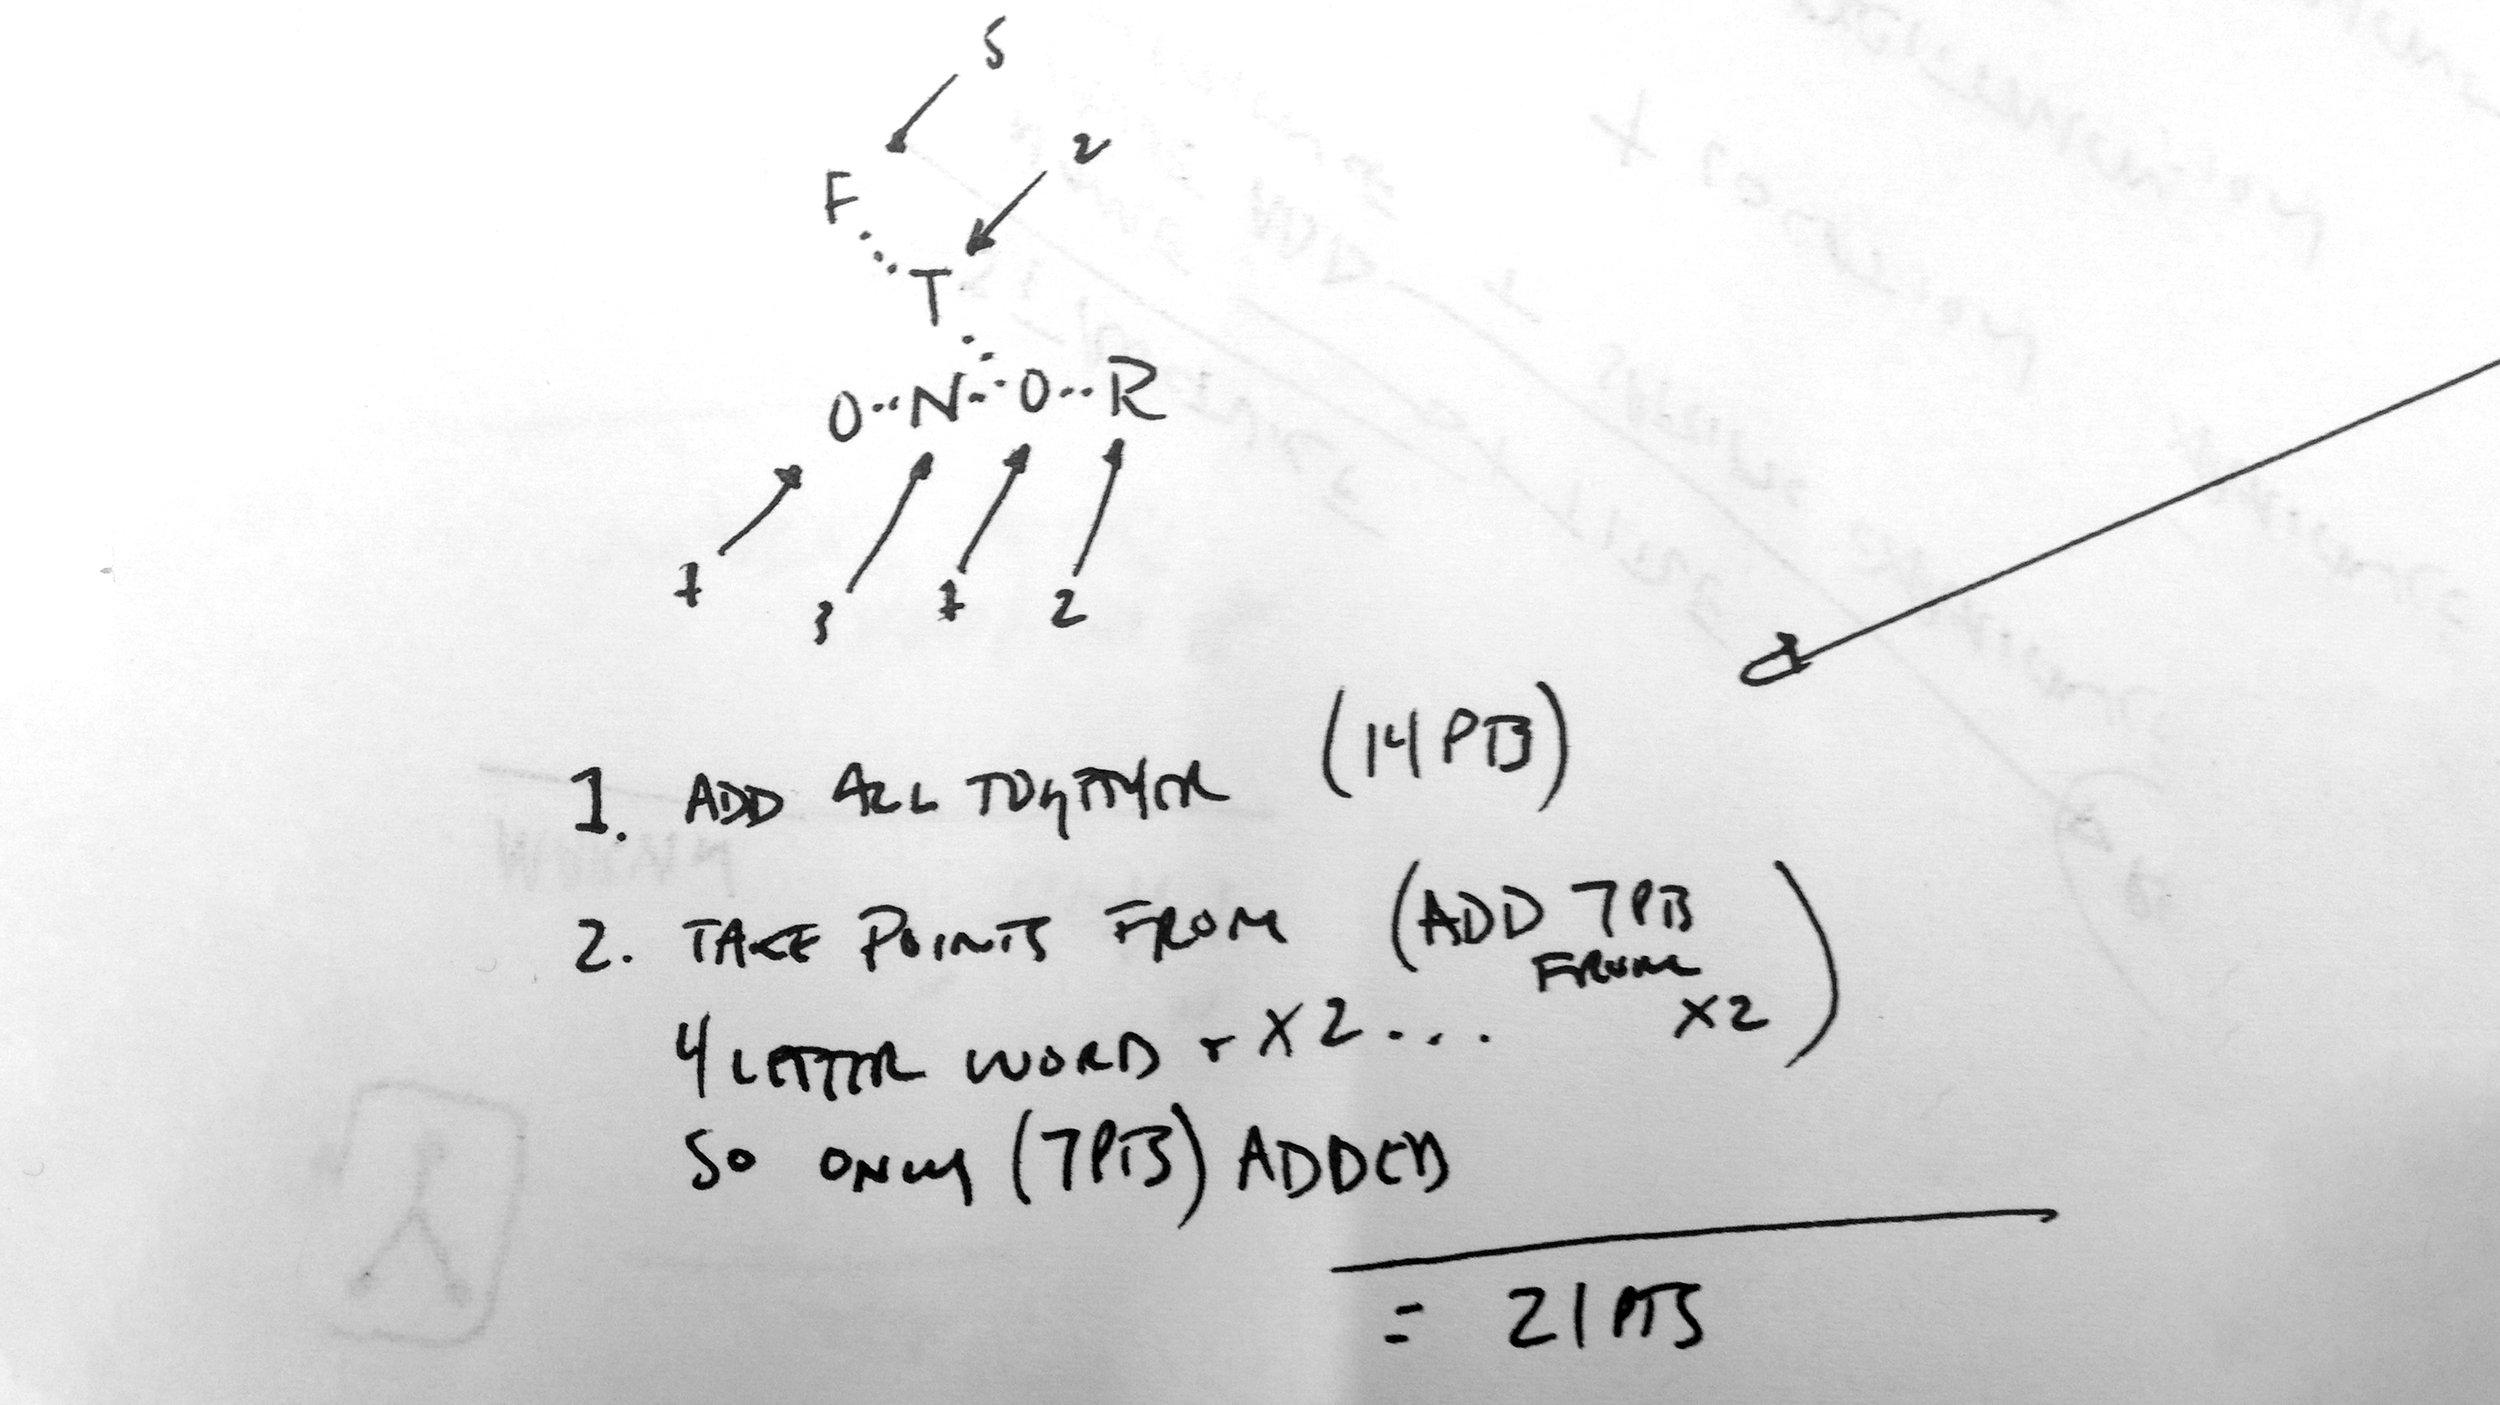 Initial efforts at understanding scoring